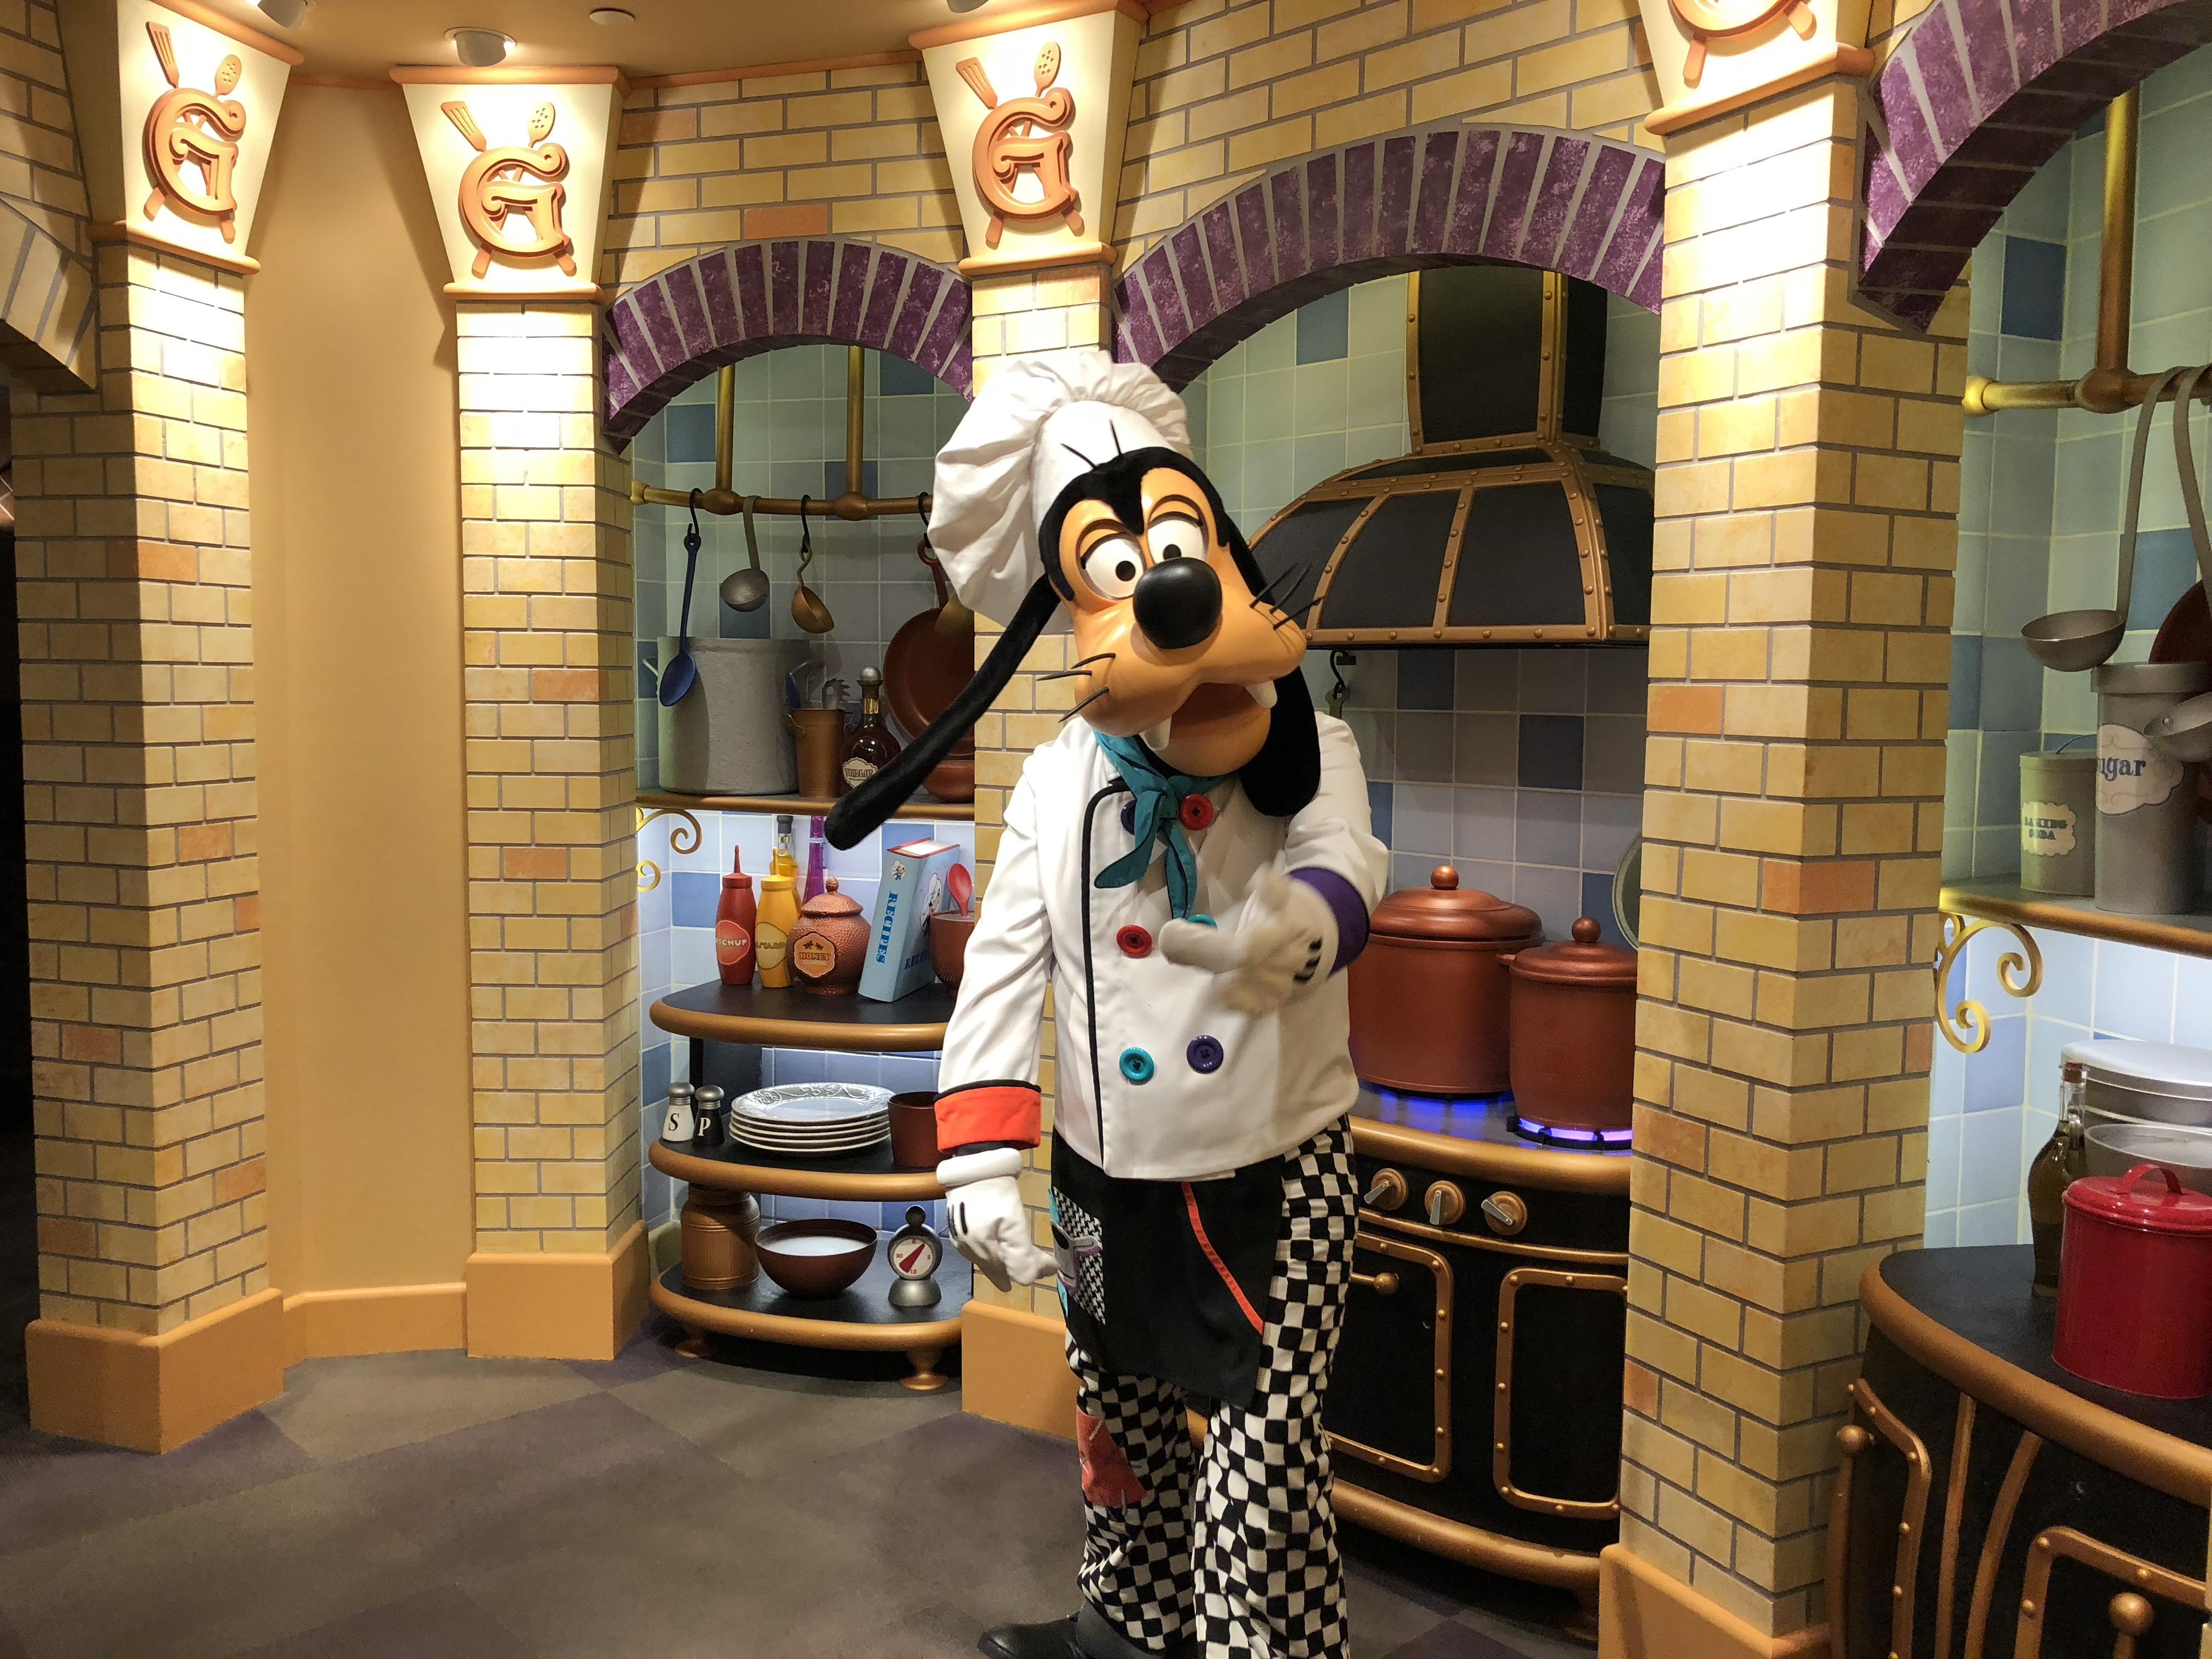 Mouseplanet Gawsh A Review Of Goofy S Kitchen By Megan Walker